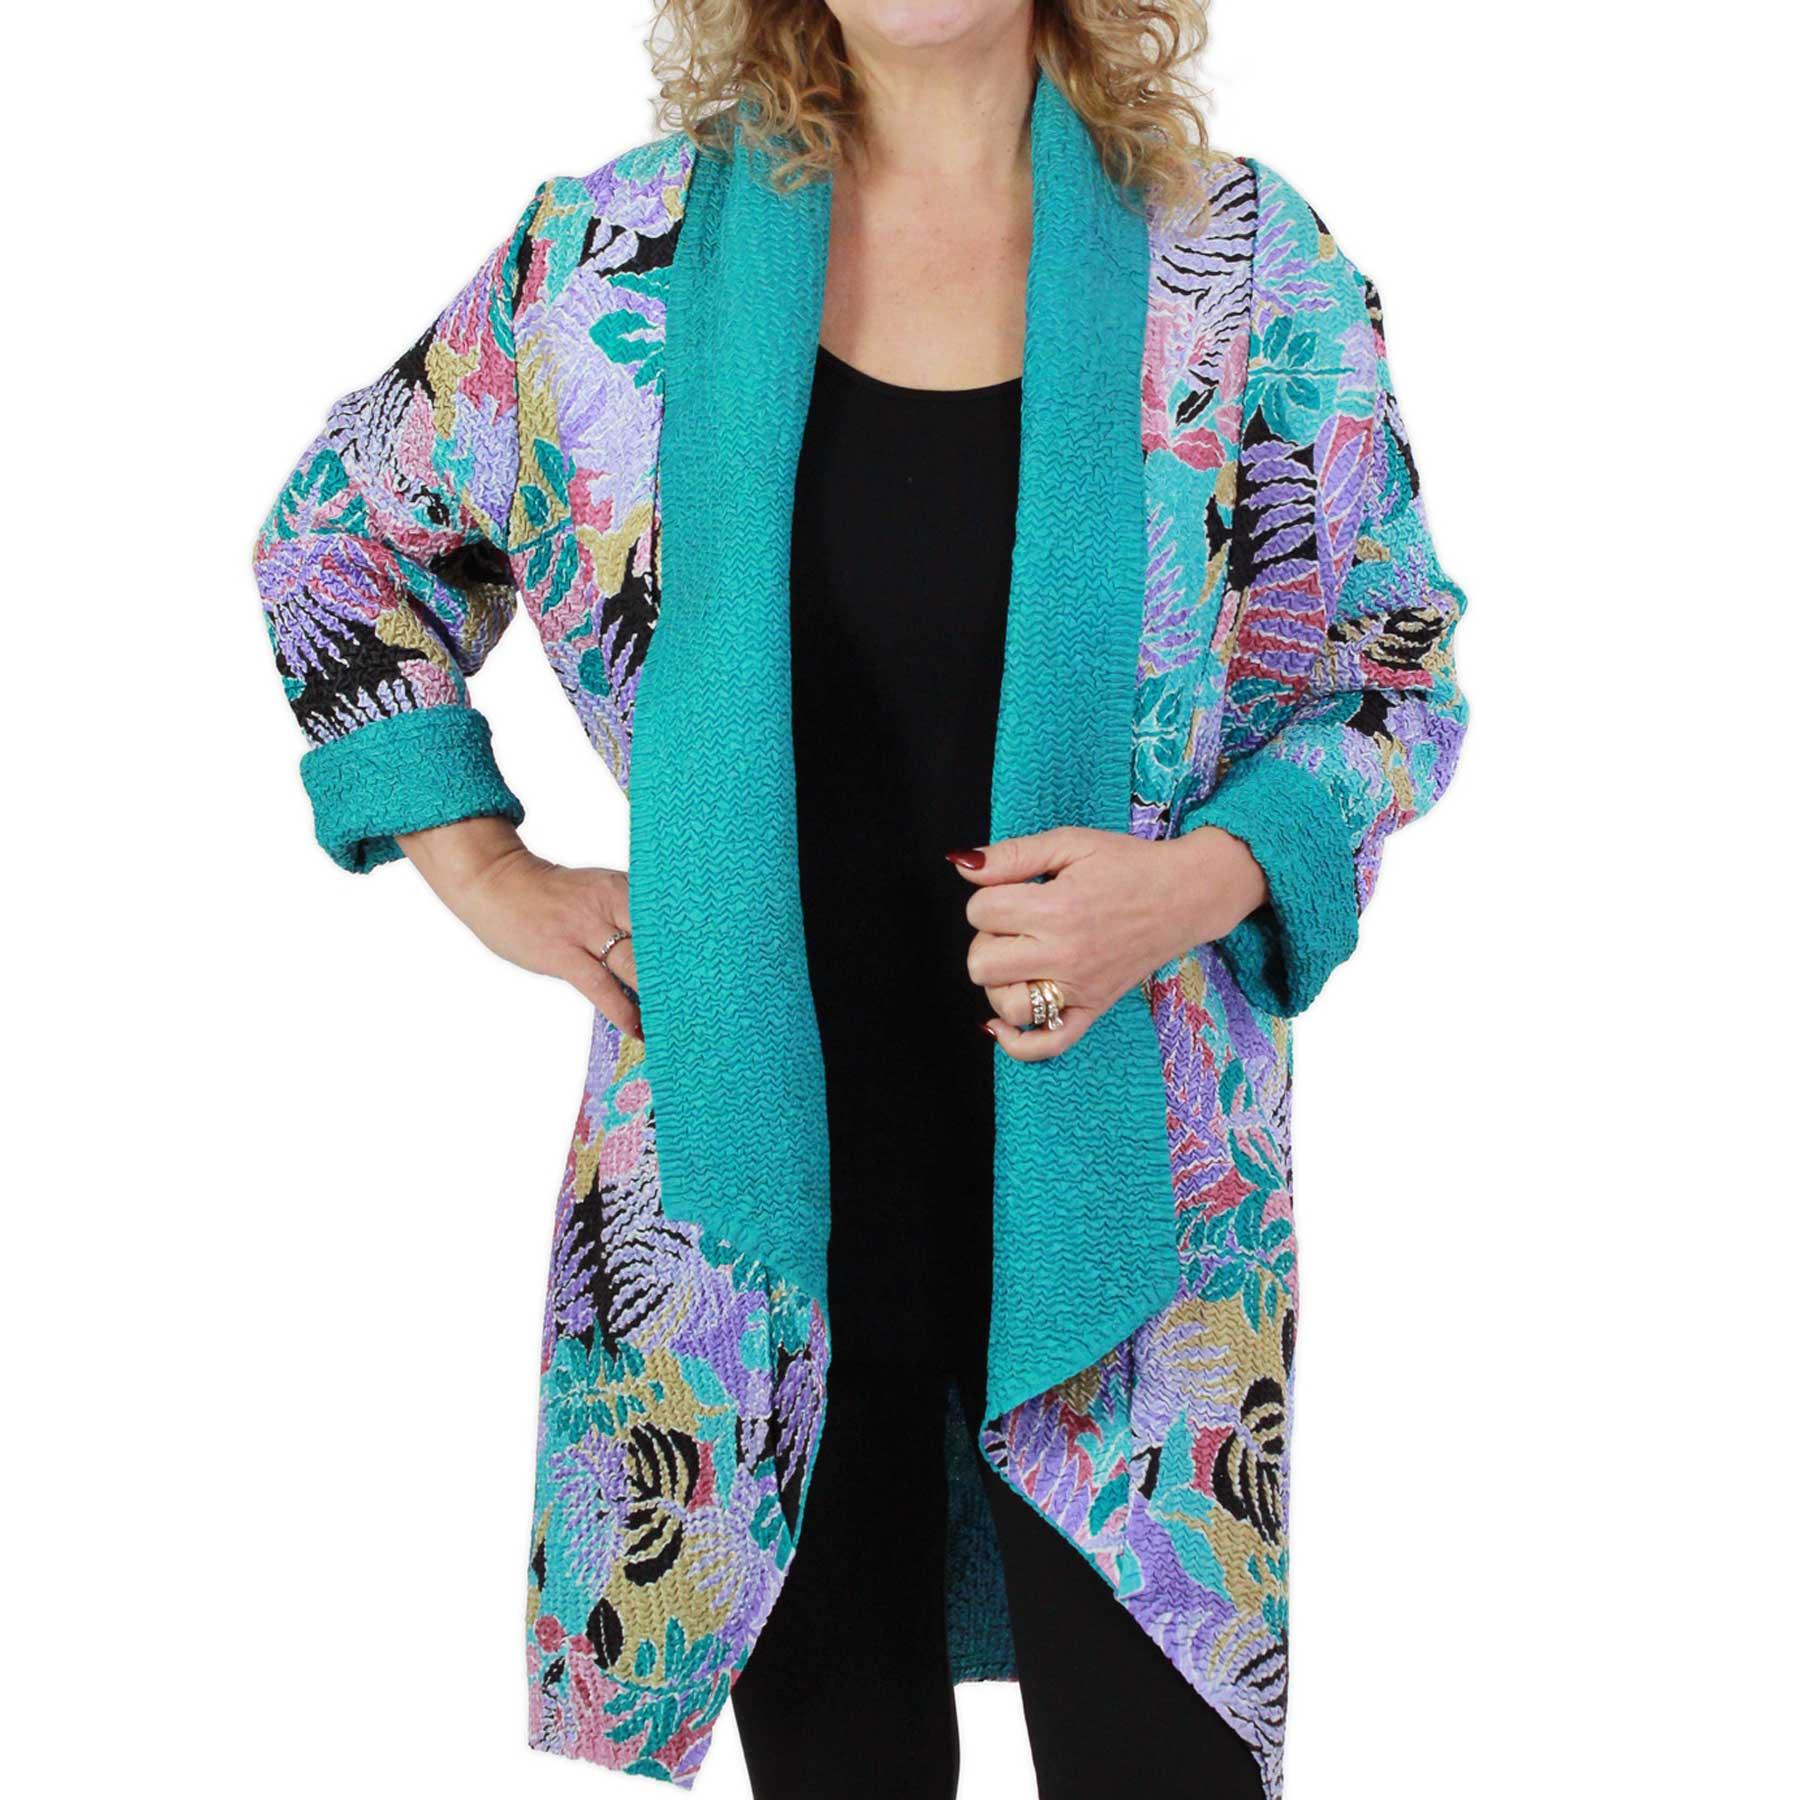 Art Crush Cardigan - Prints - Woman Size - #1061 Tropical Breeze